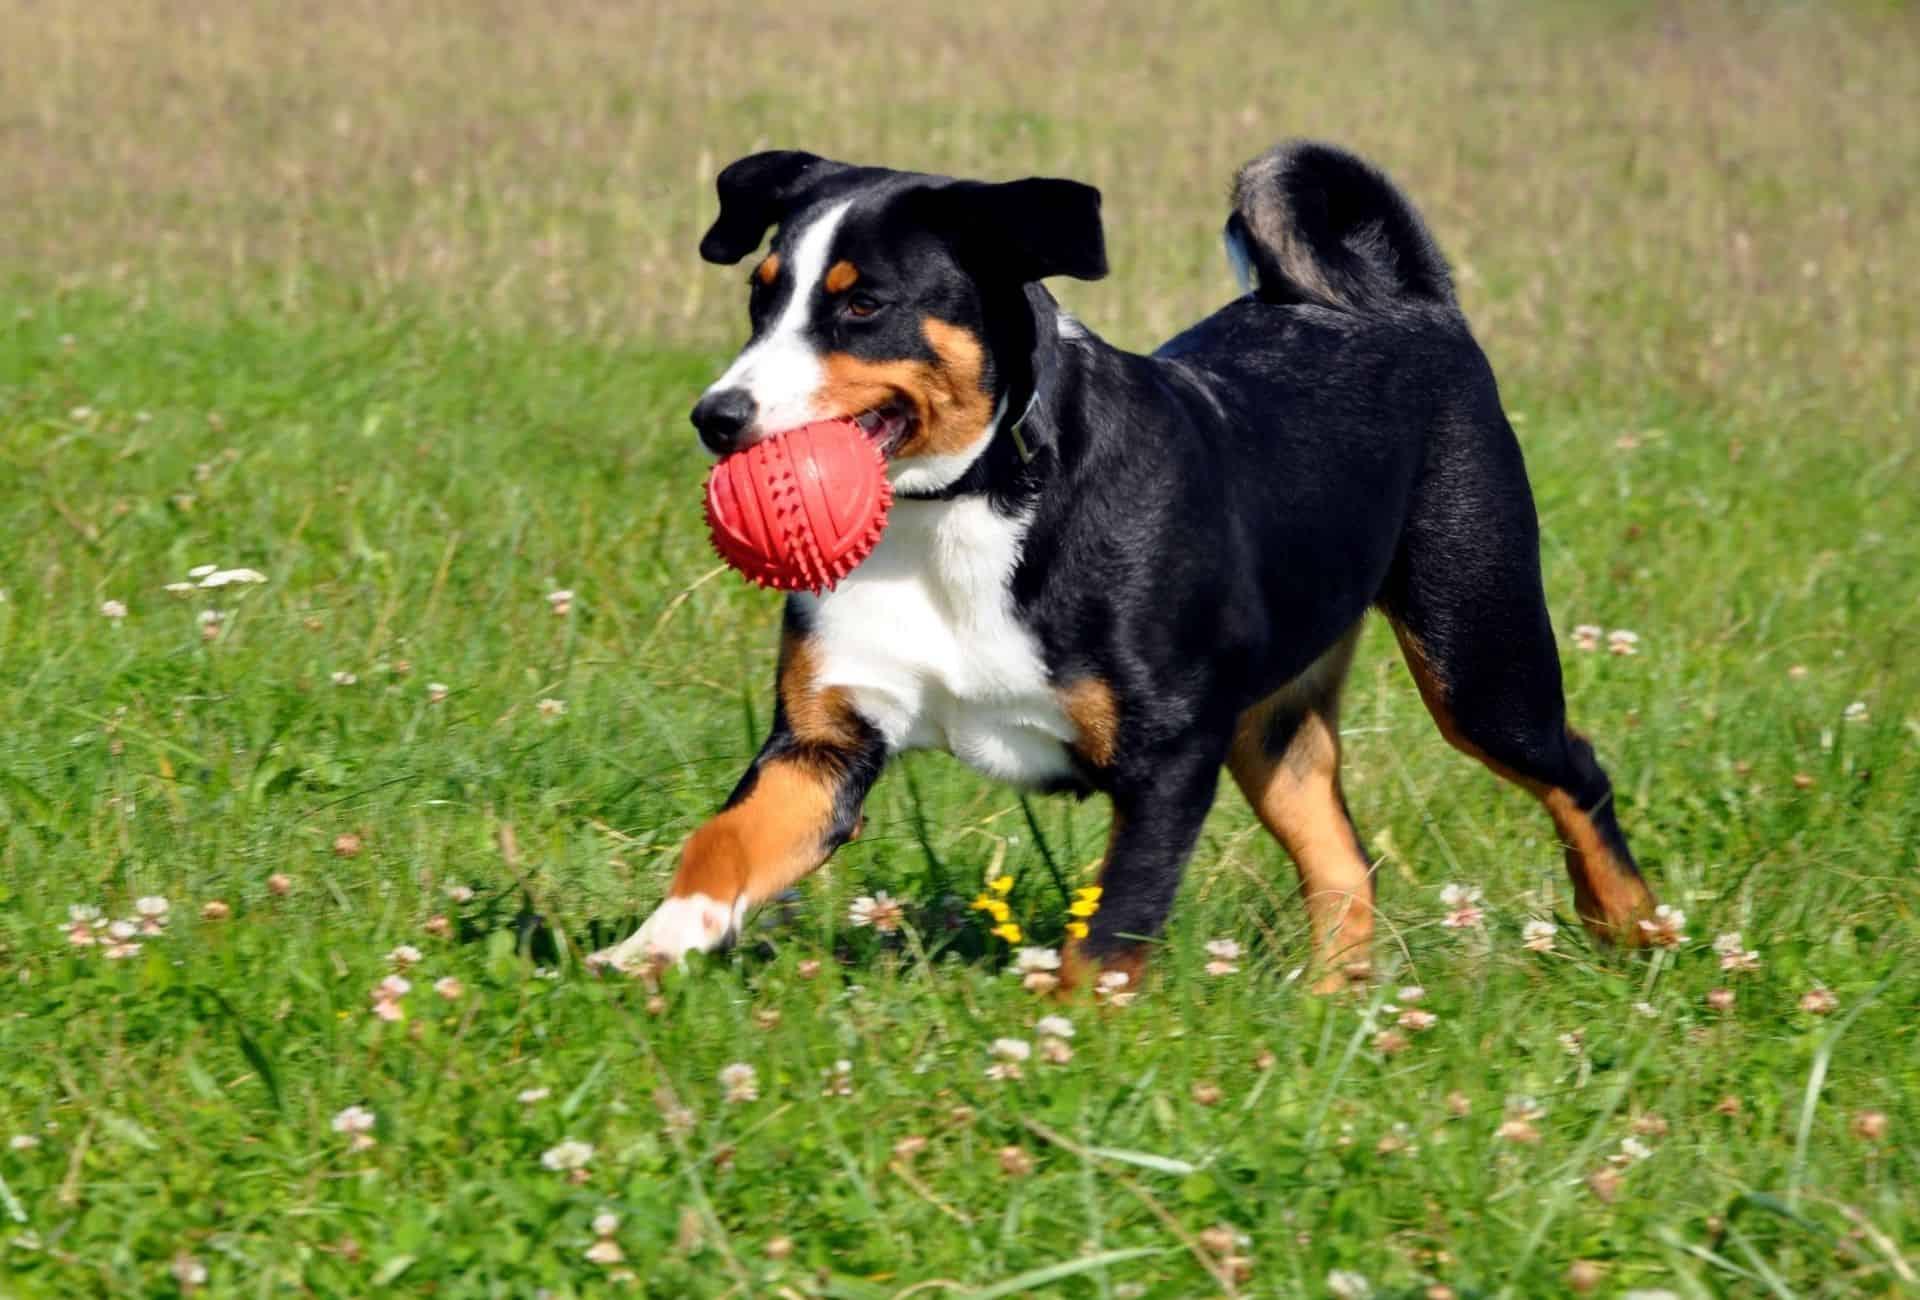 Appenzeller Sennenhund recuperando la bola.